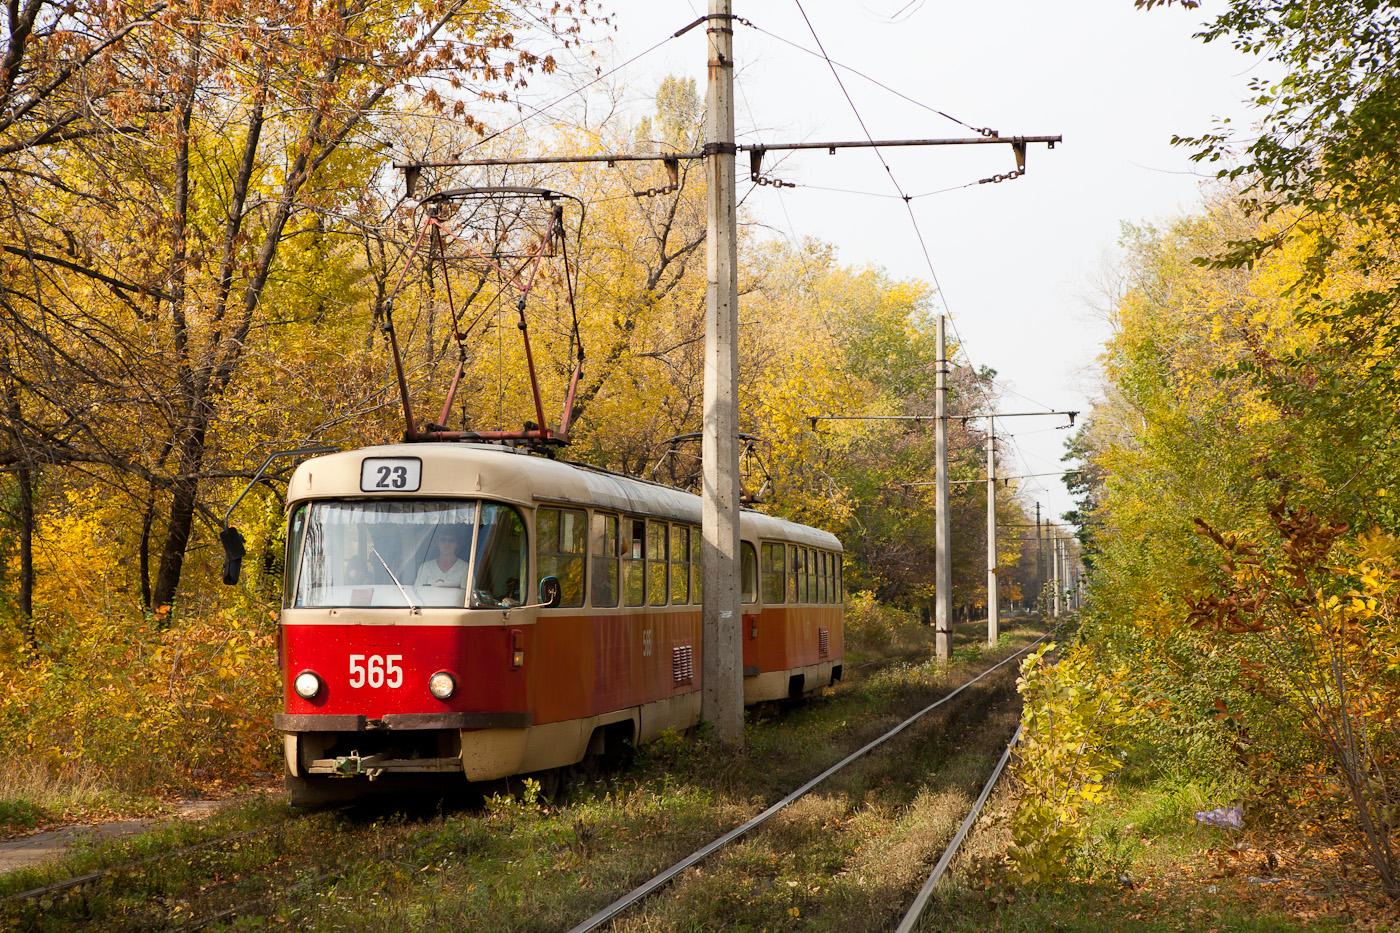 Strassenbahn wird fotografiert